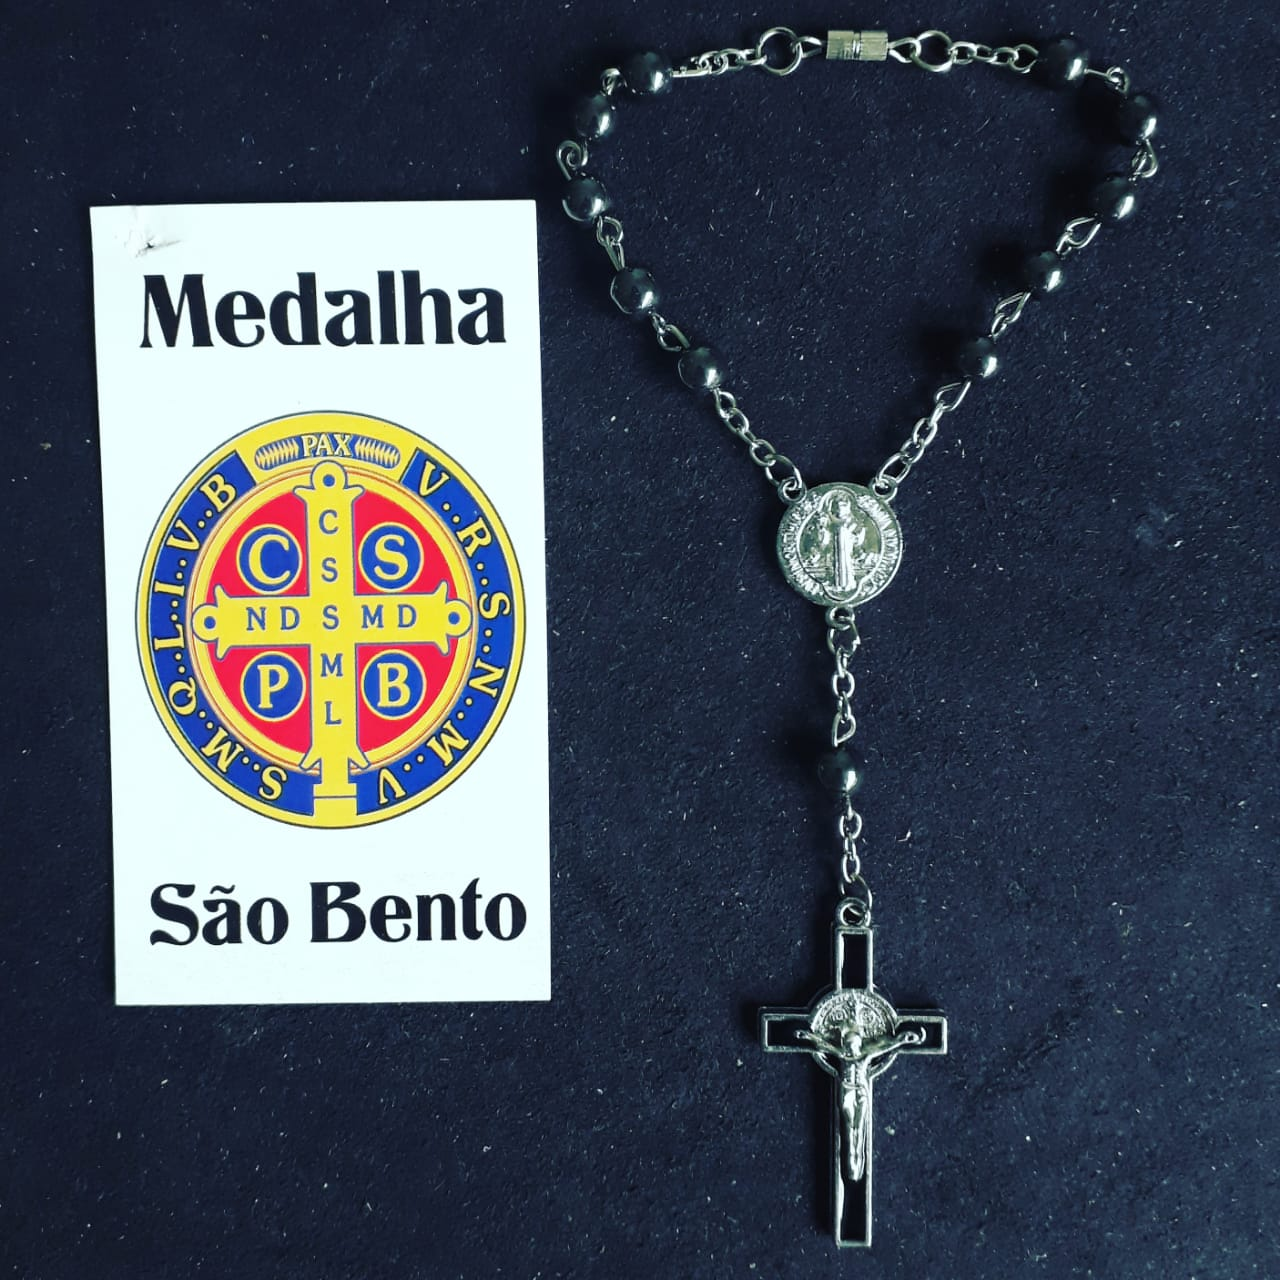 T21 - Dezena Hematita 8mm p/ Carro c/ Entremeio Med. São Bento  - VindVedShop - Distribuidora Catolica